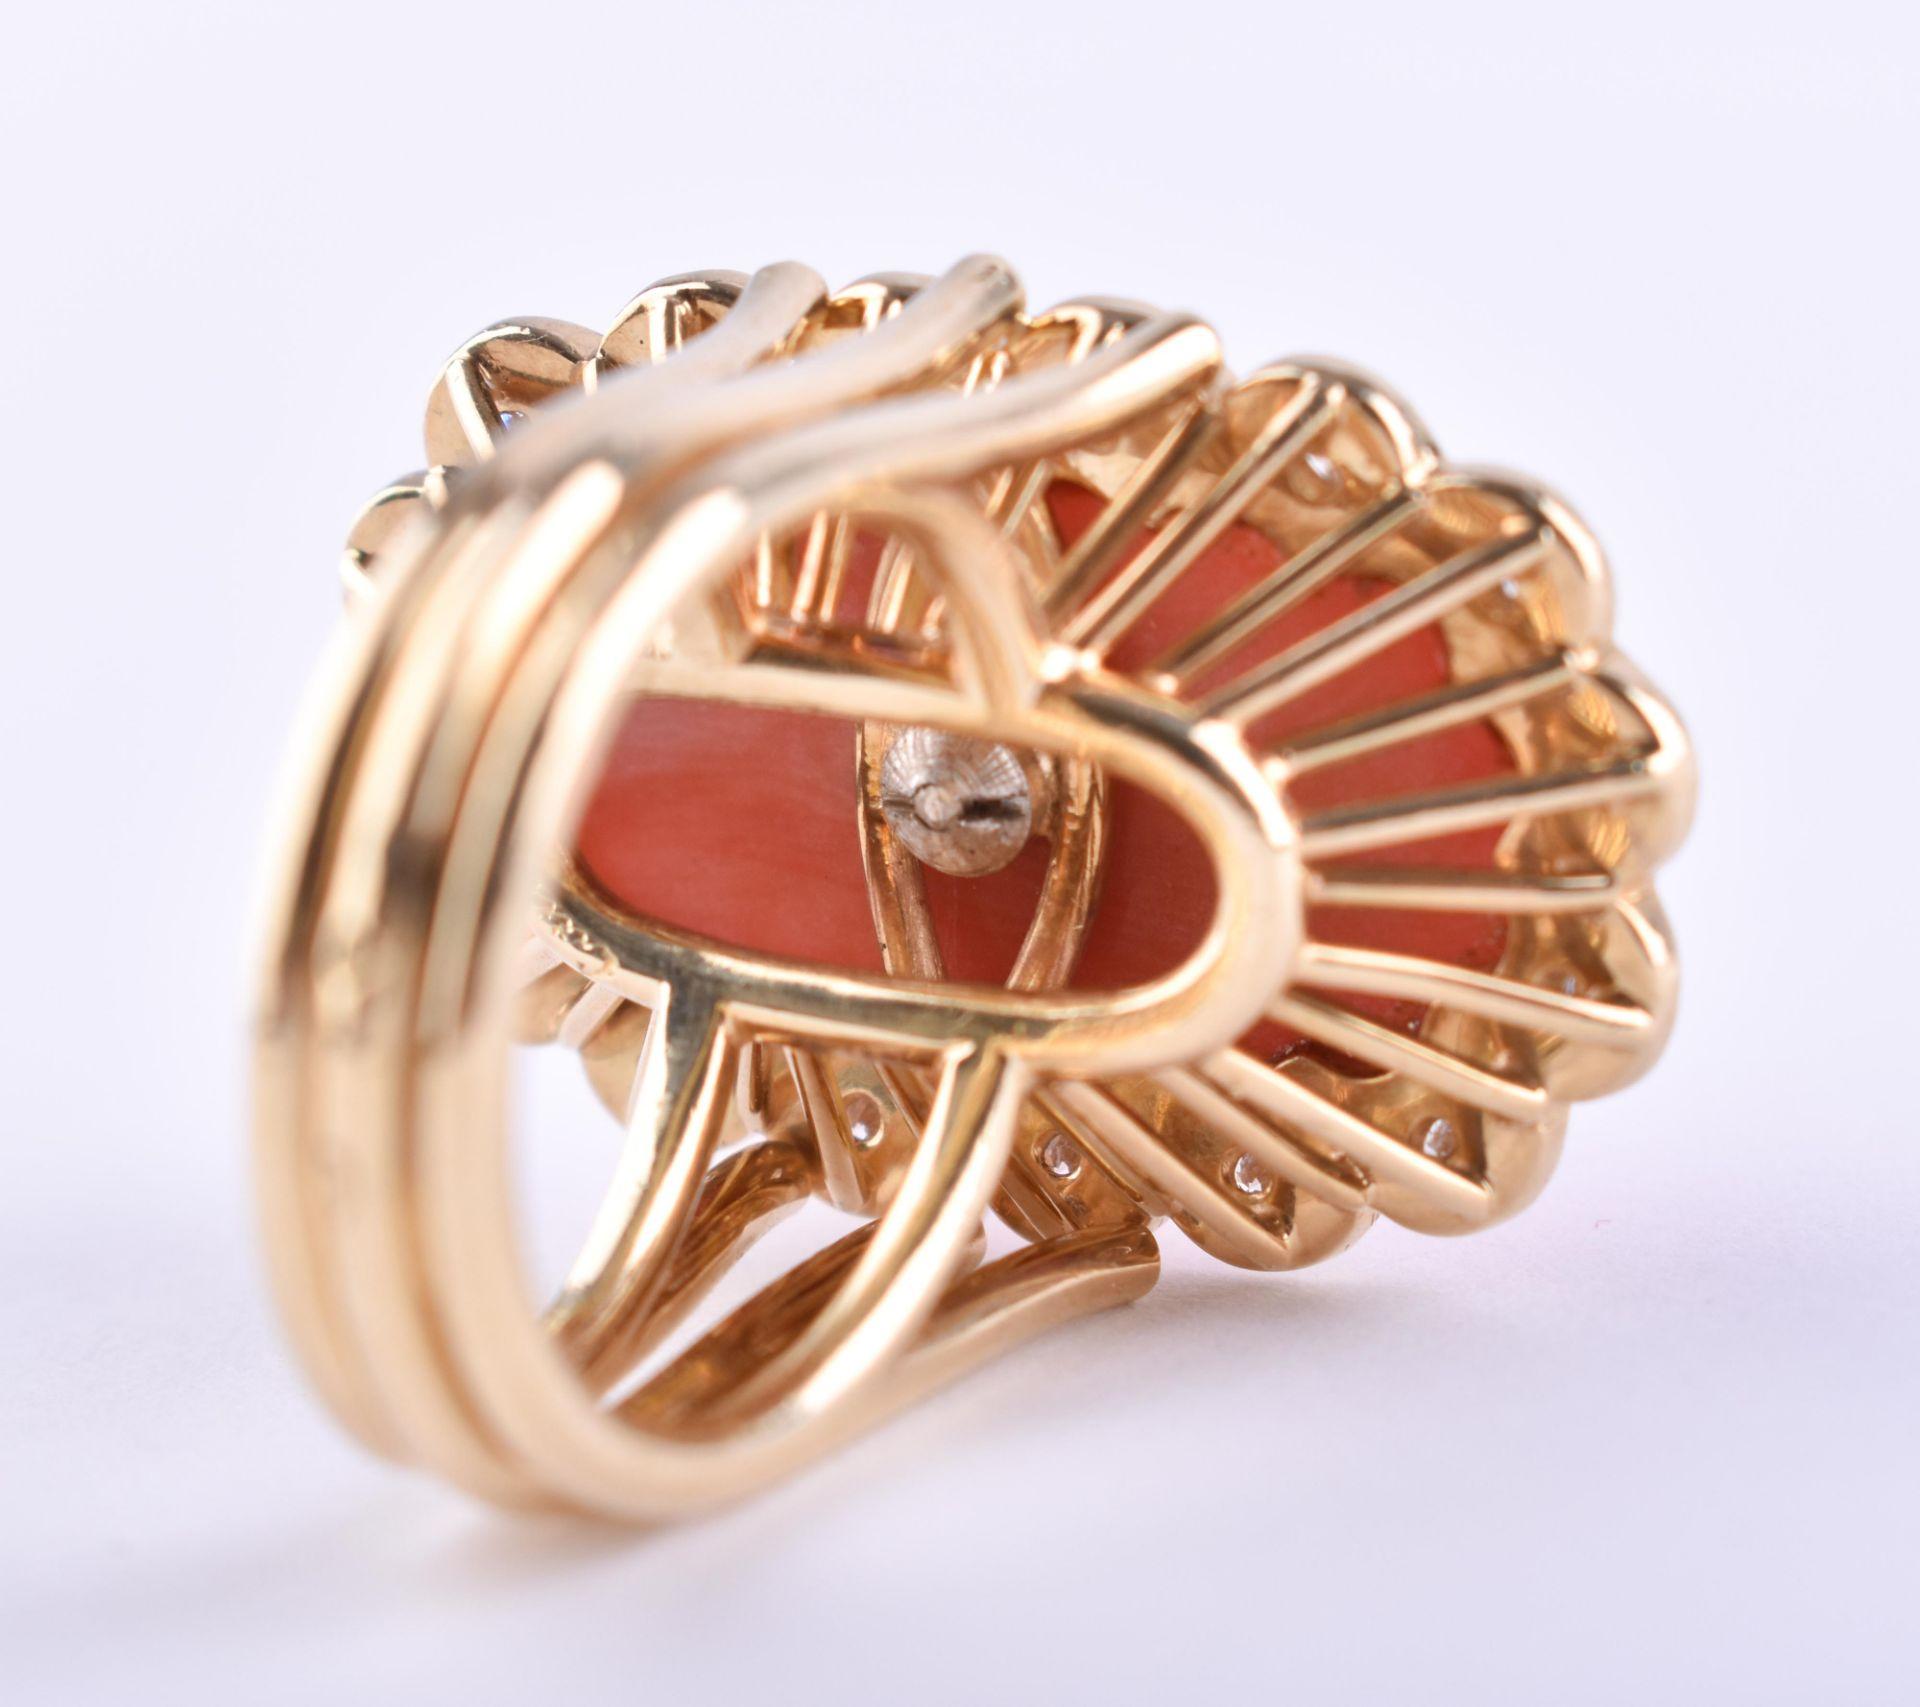 Ladies coral diamond ring Cartier - Image 4 of 4